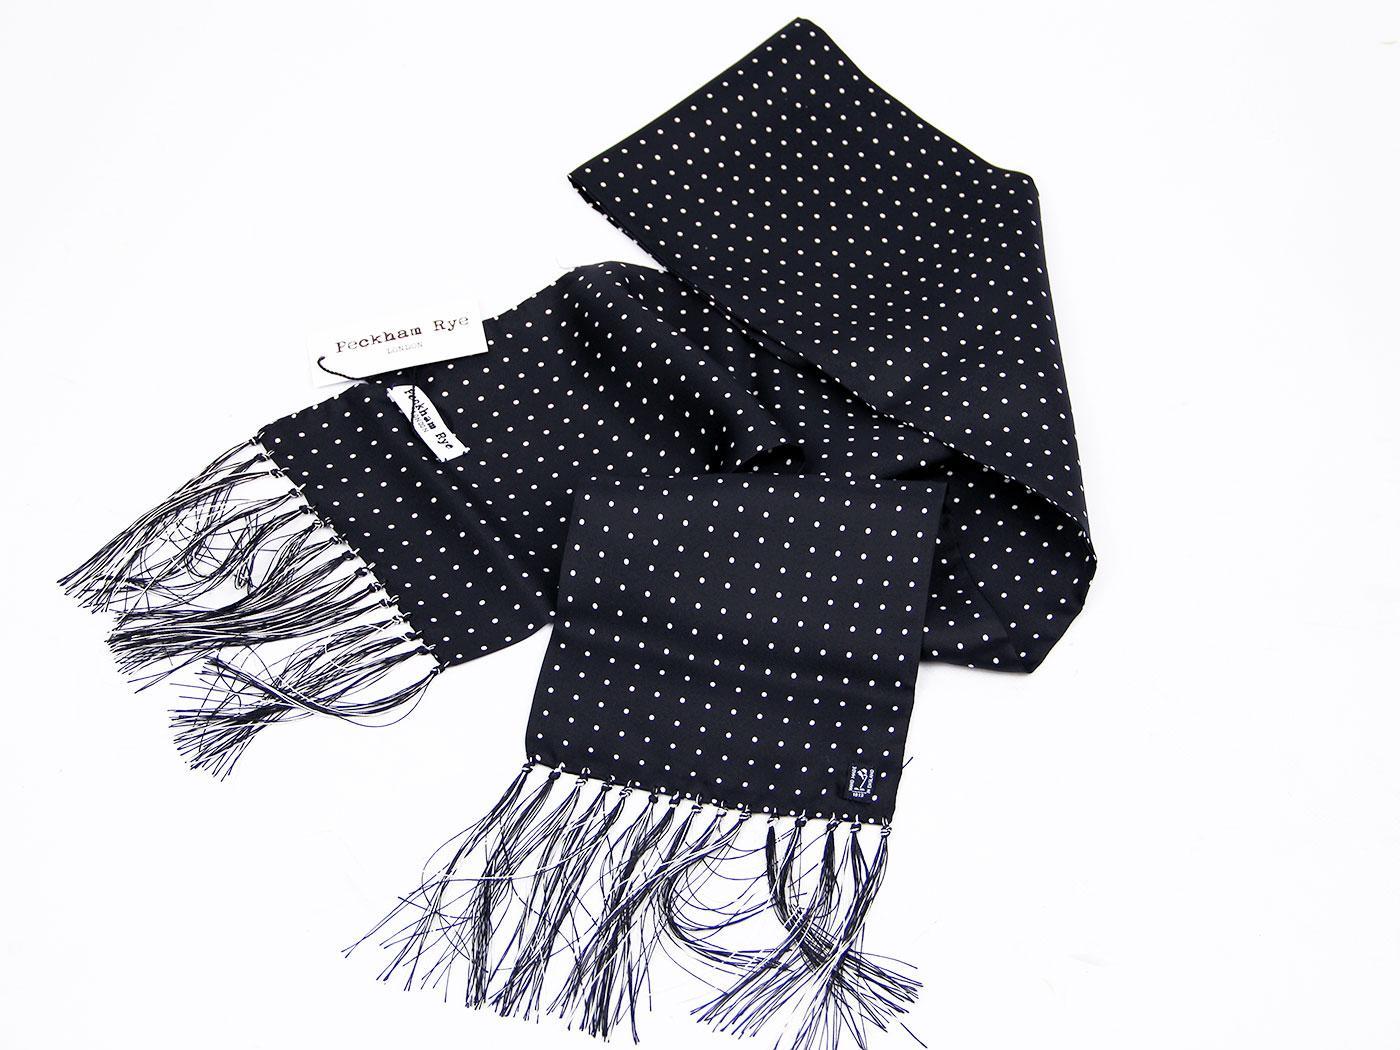 peckham rye spot retro 60s mod black silk scarf